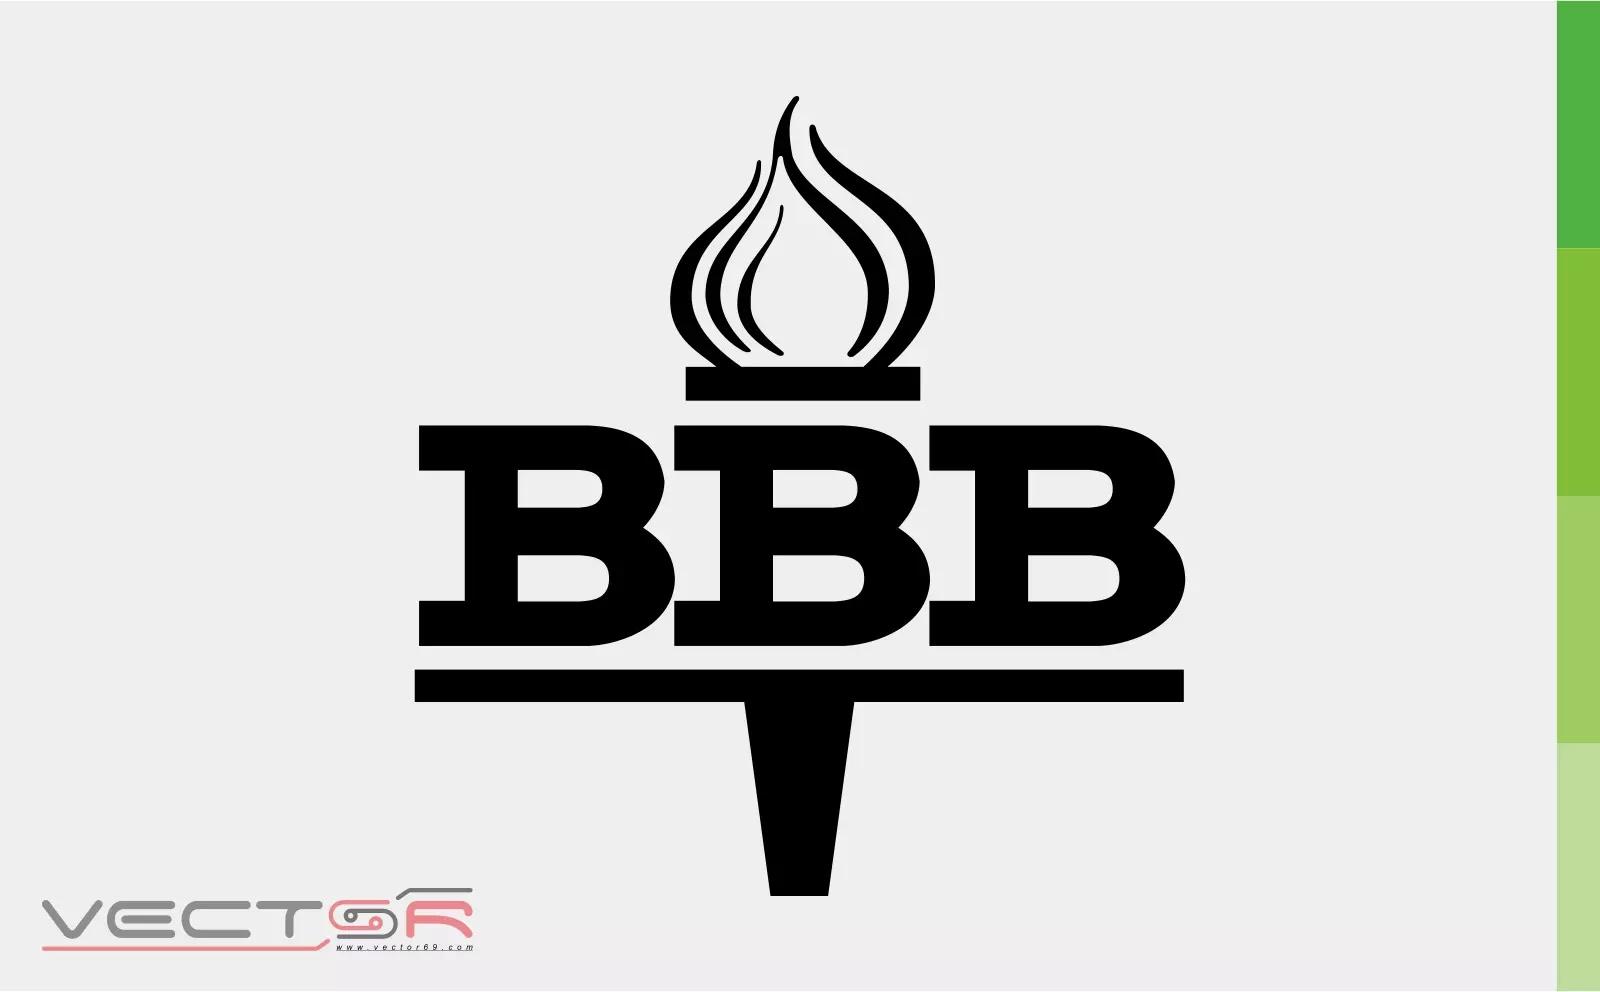 BBB - Better Business Bureau (1965) Logo - Download Vector File CDR (CorelDraw)